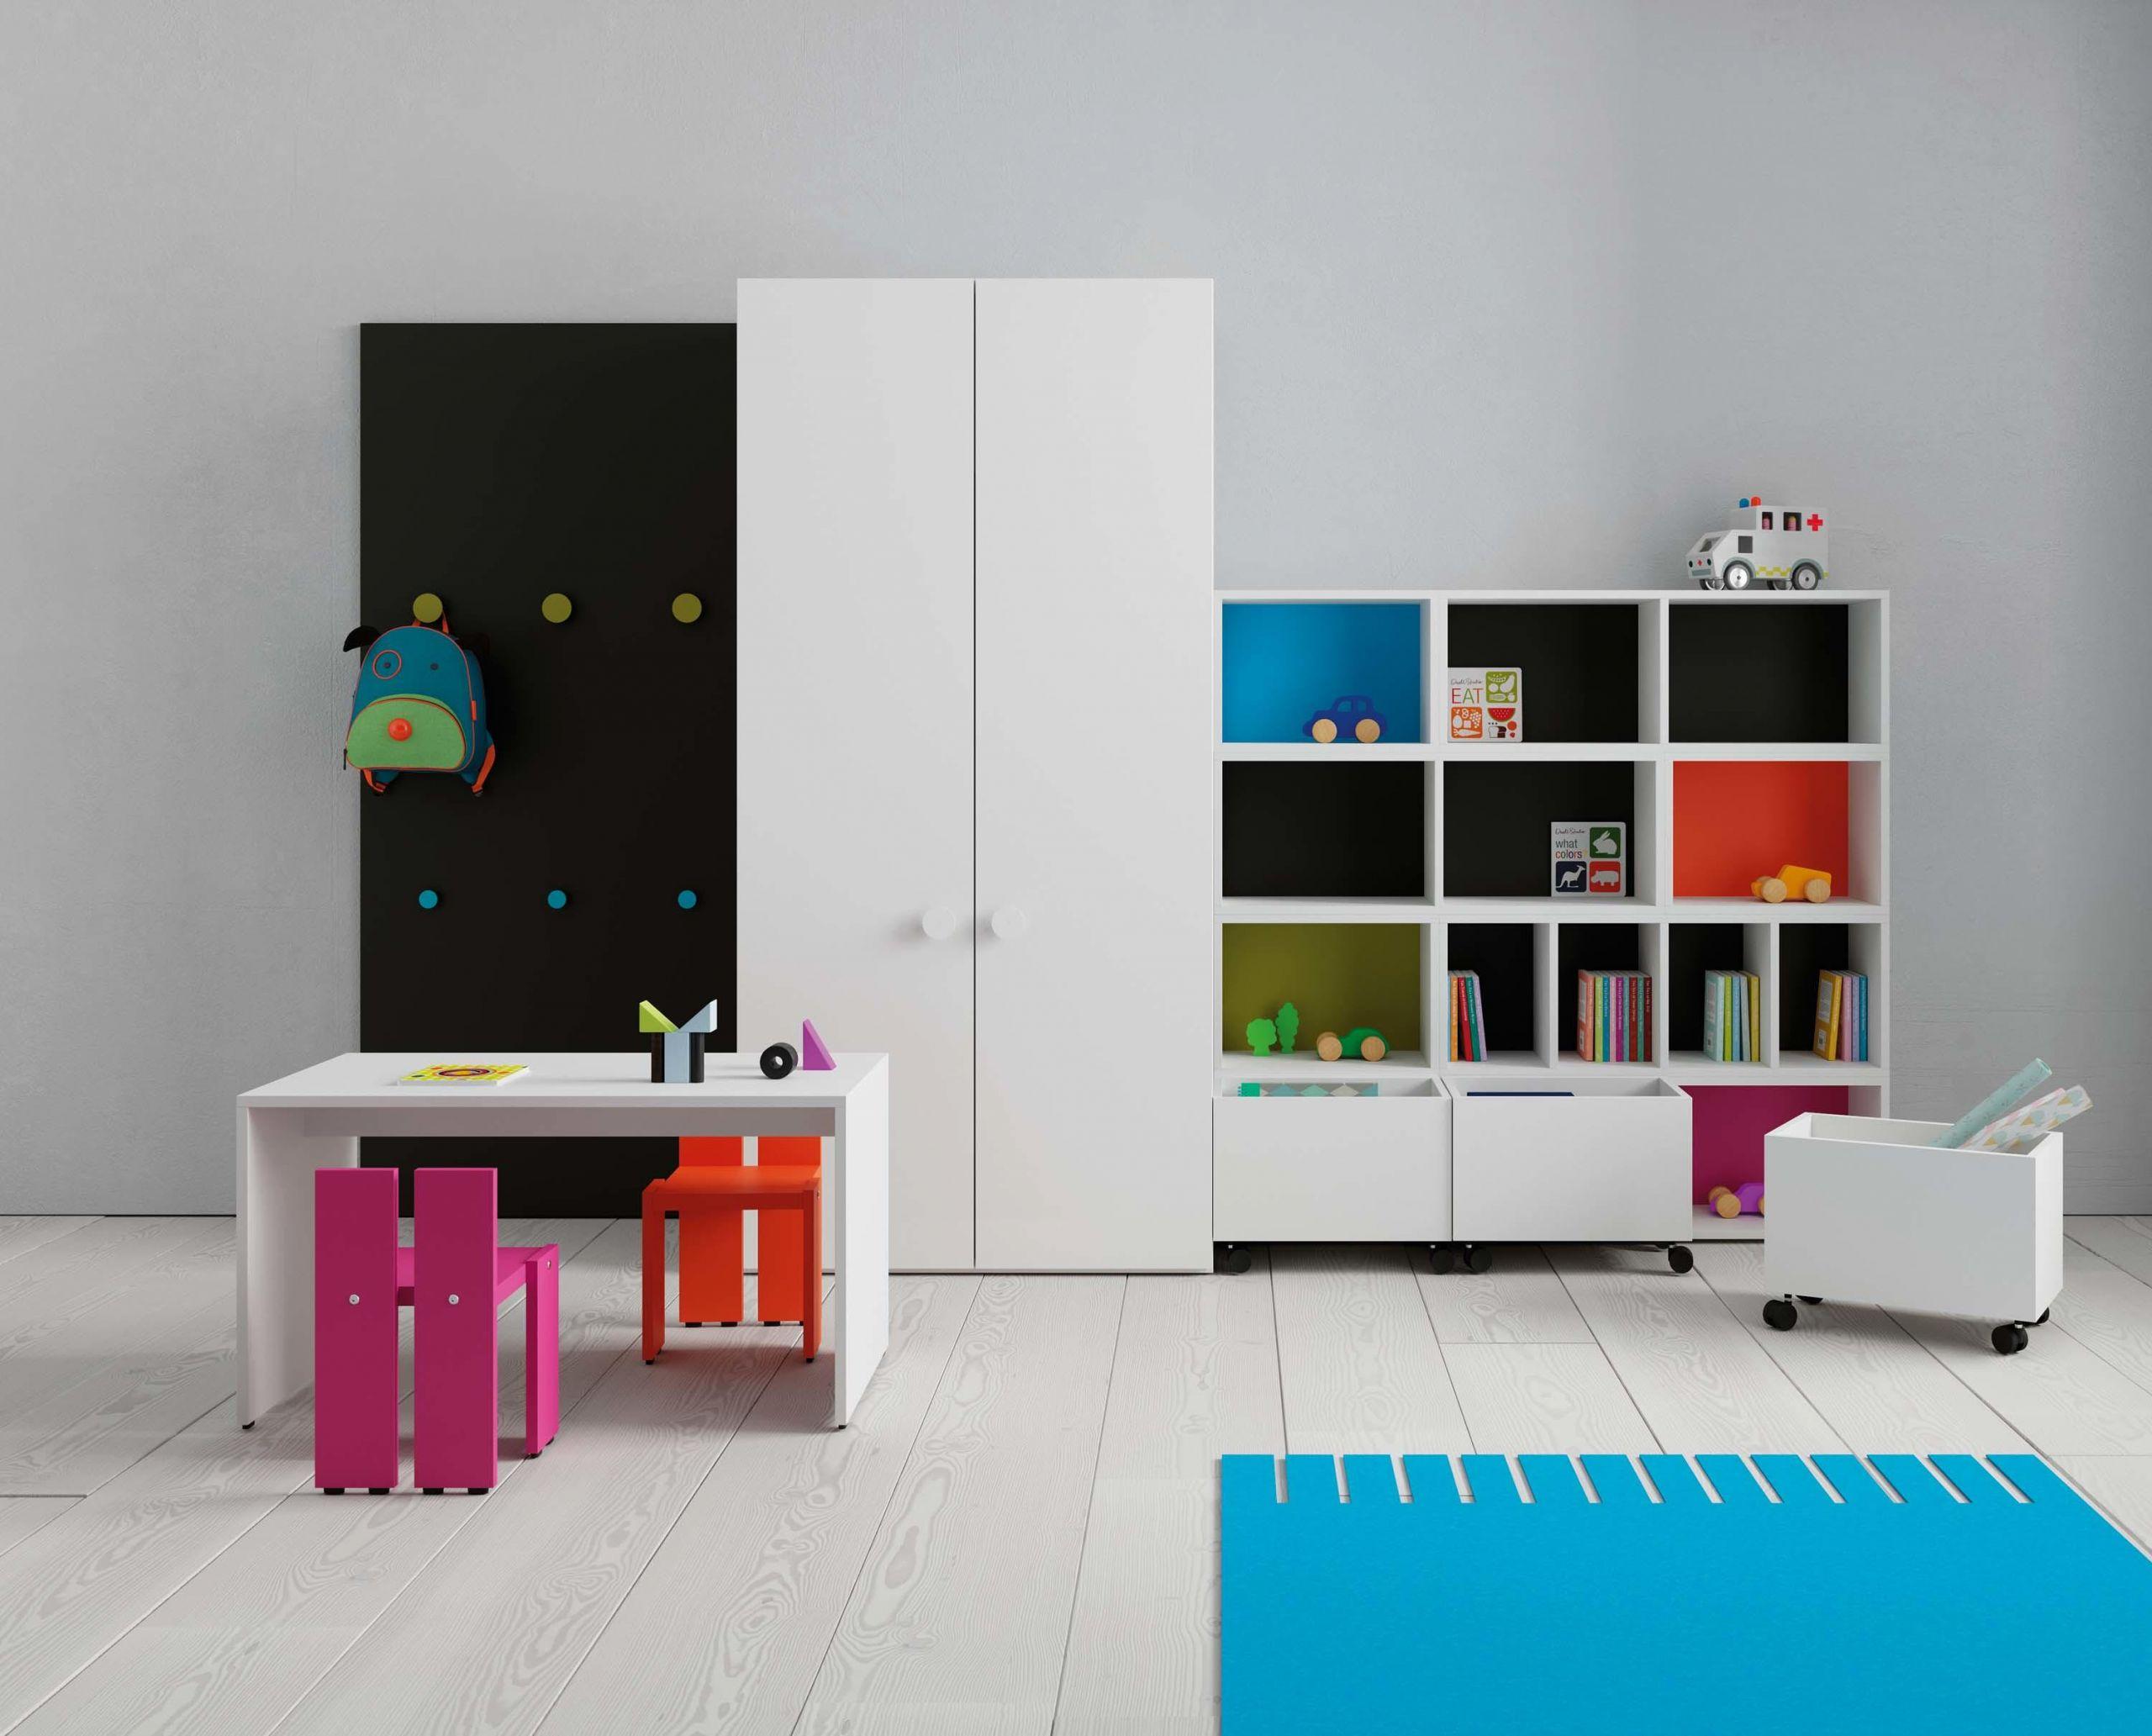 Kids Game Room Furniture  CHILDREN S ROOM FOR GAMES 07 Kids storage furniture from